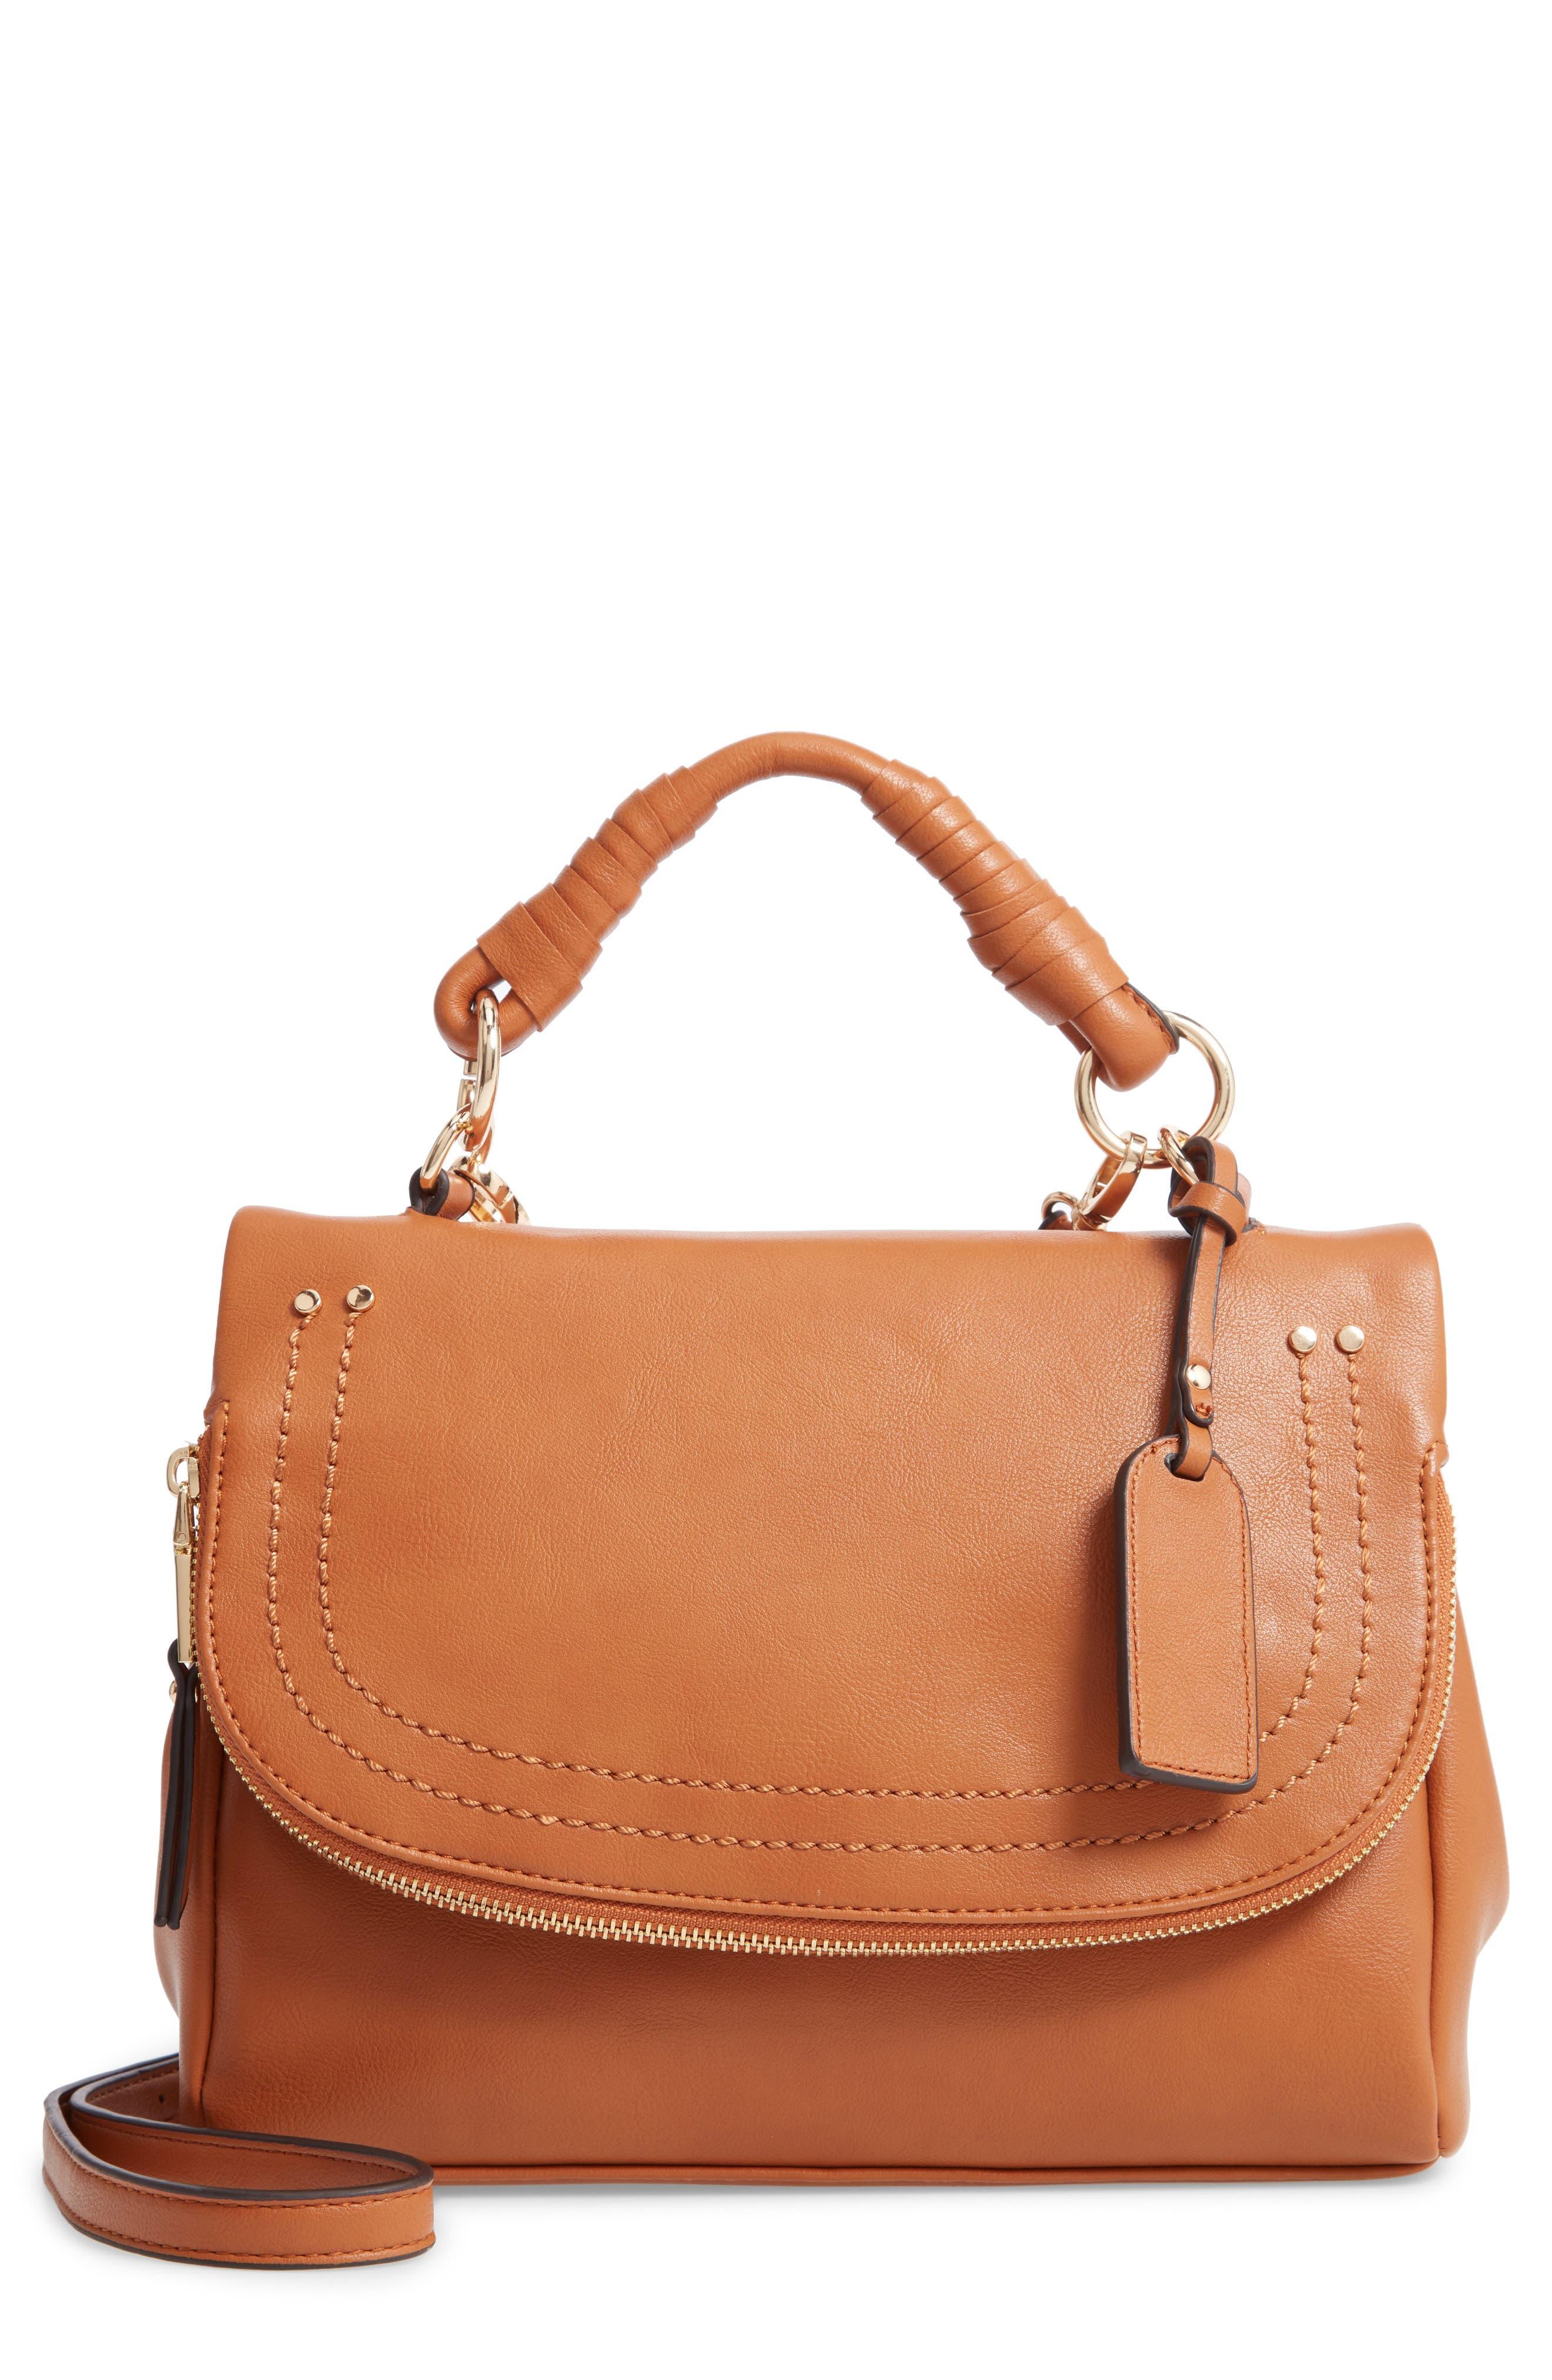 SOLE SOCIETY Rubie Faux Leather Crossbody Bag, Main, color, COGNAC